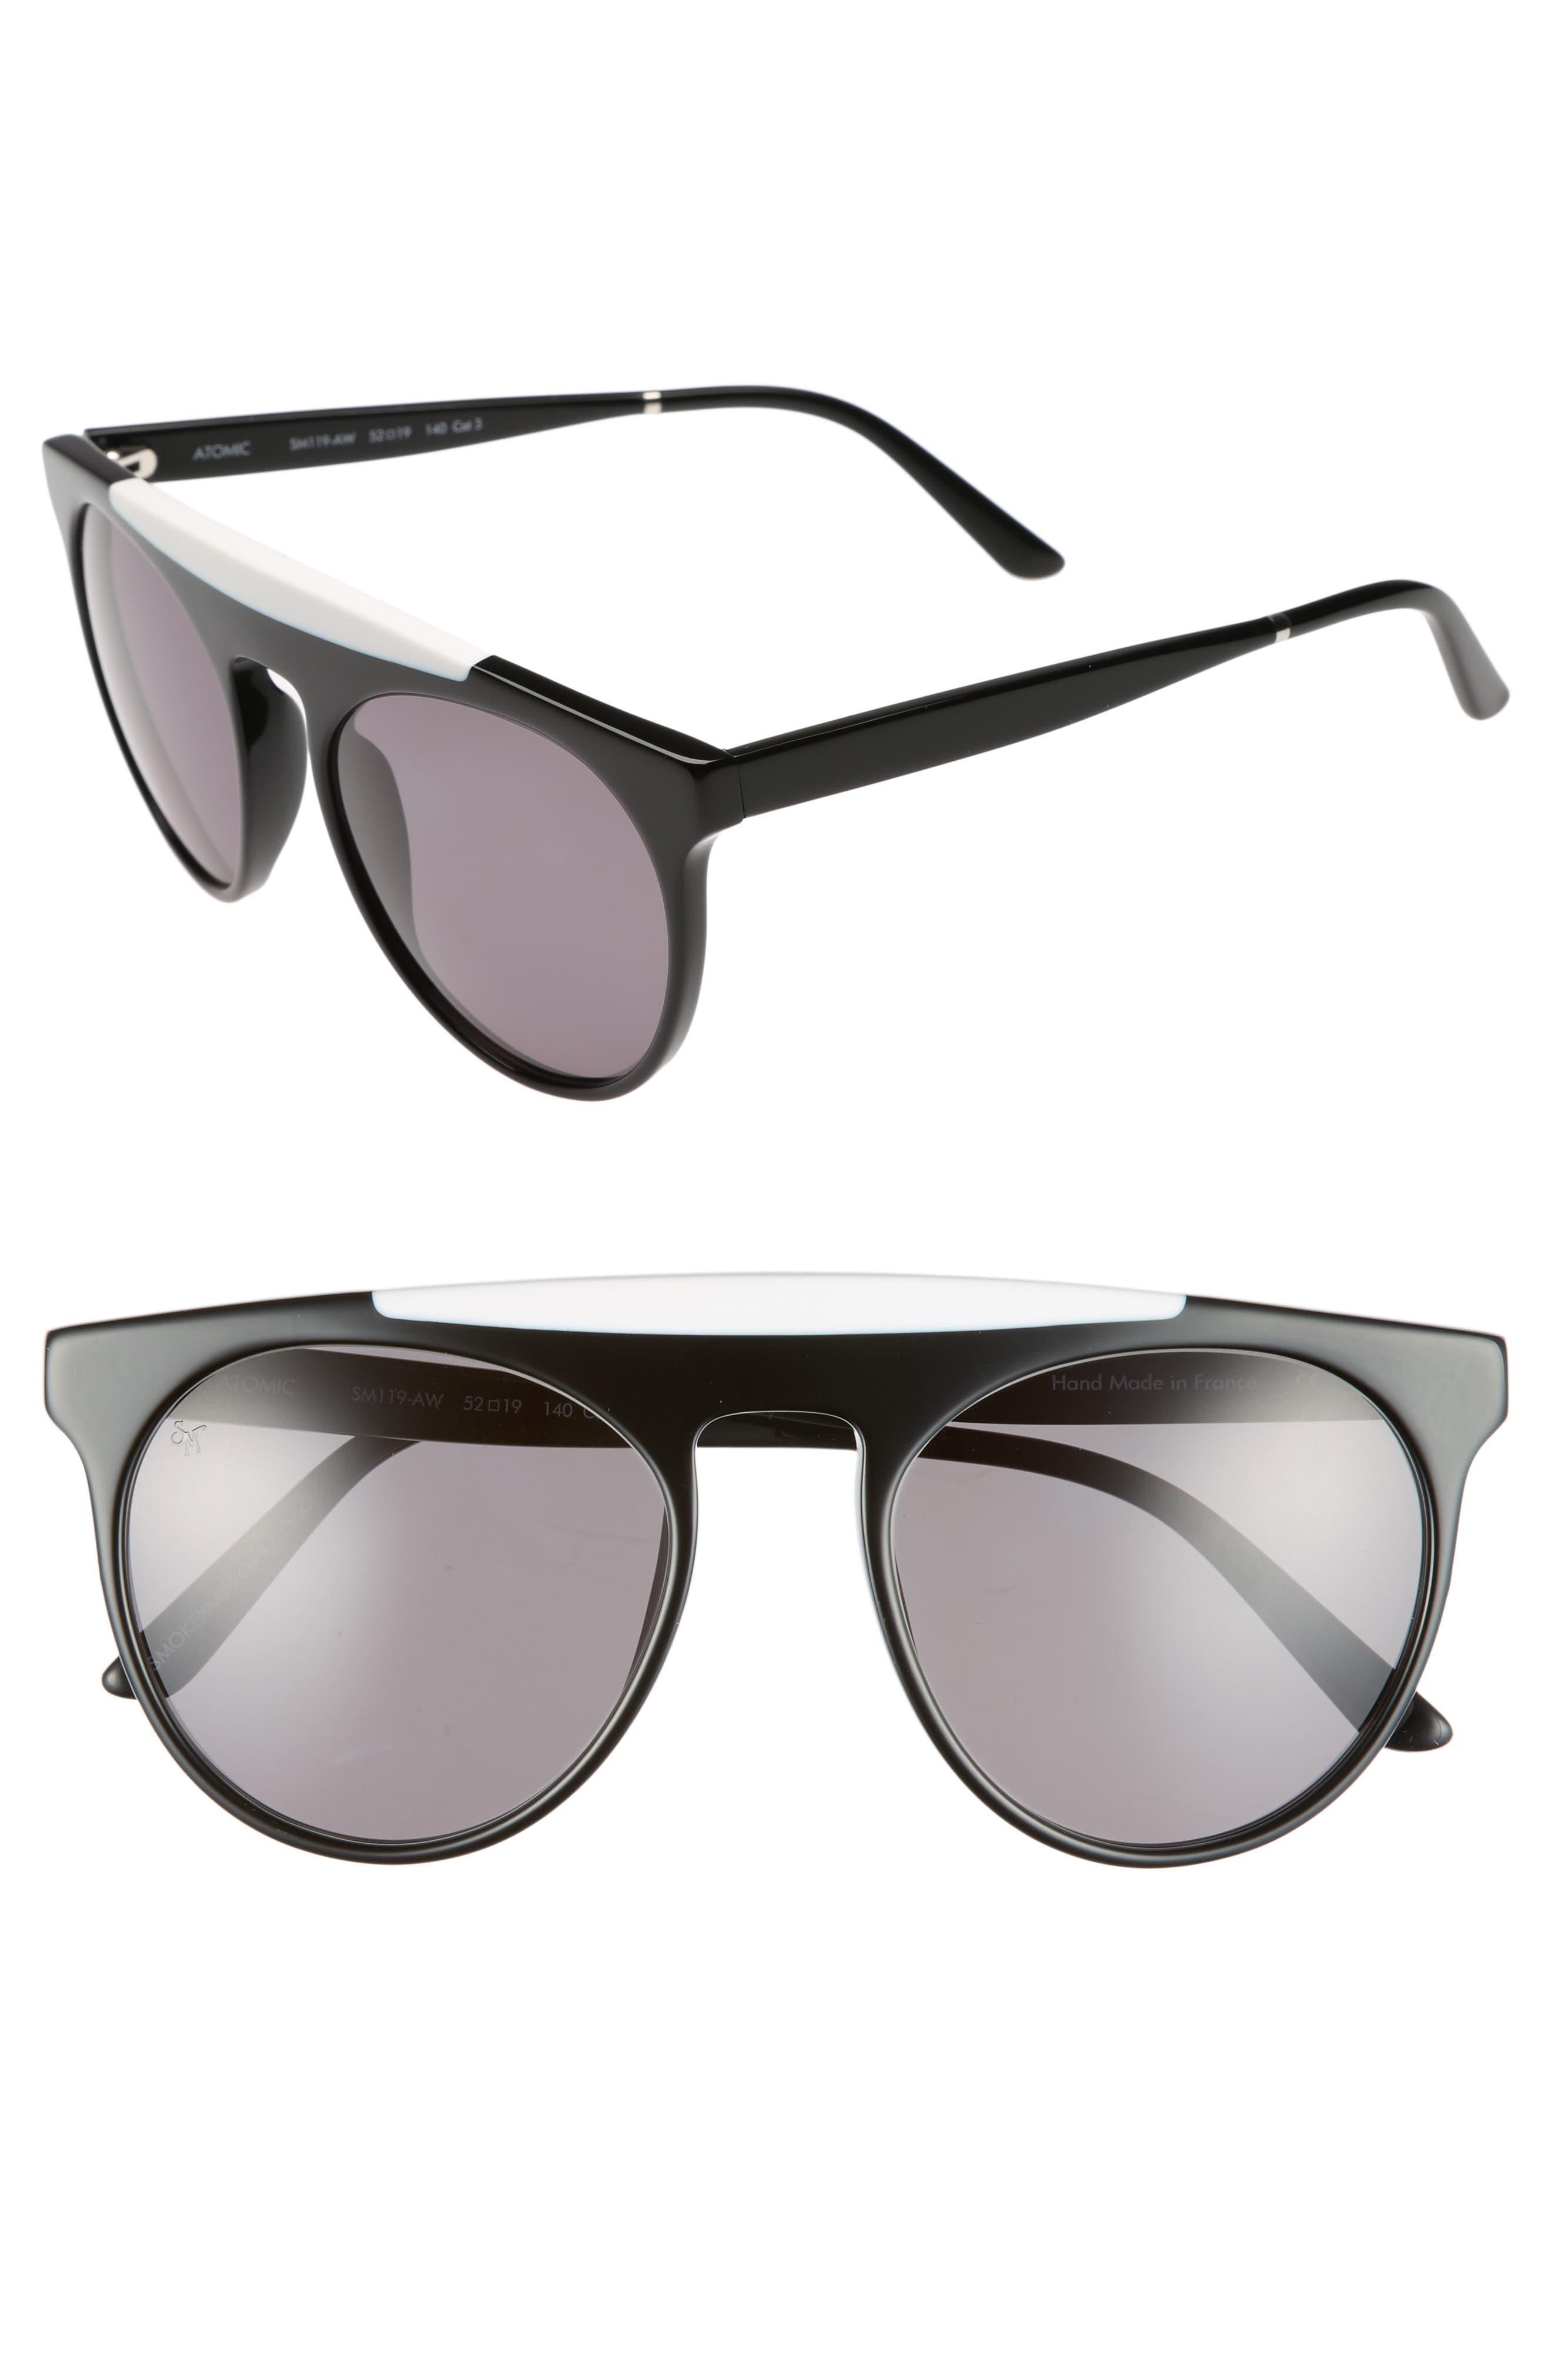 Atomic 52mm Sunglasses,                             Main thumbnail 1, color,                             001